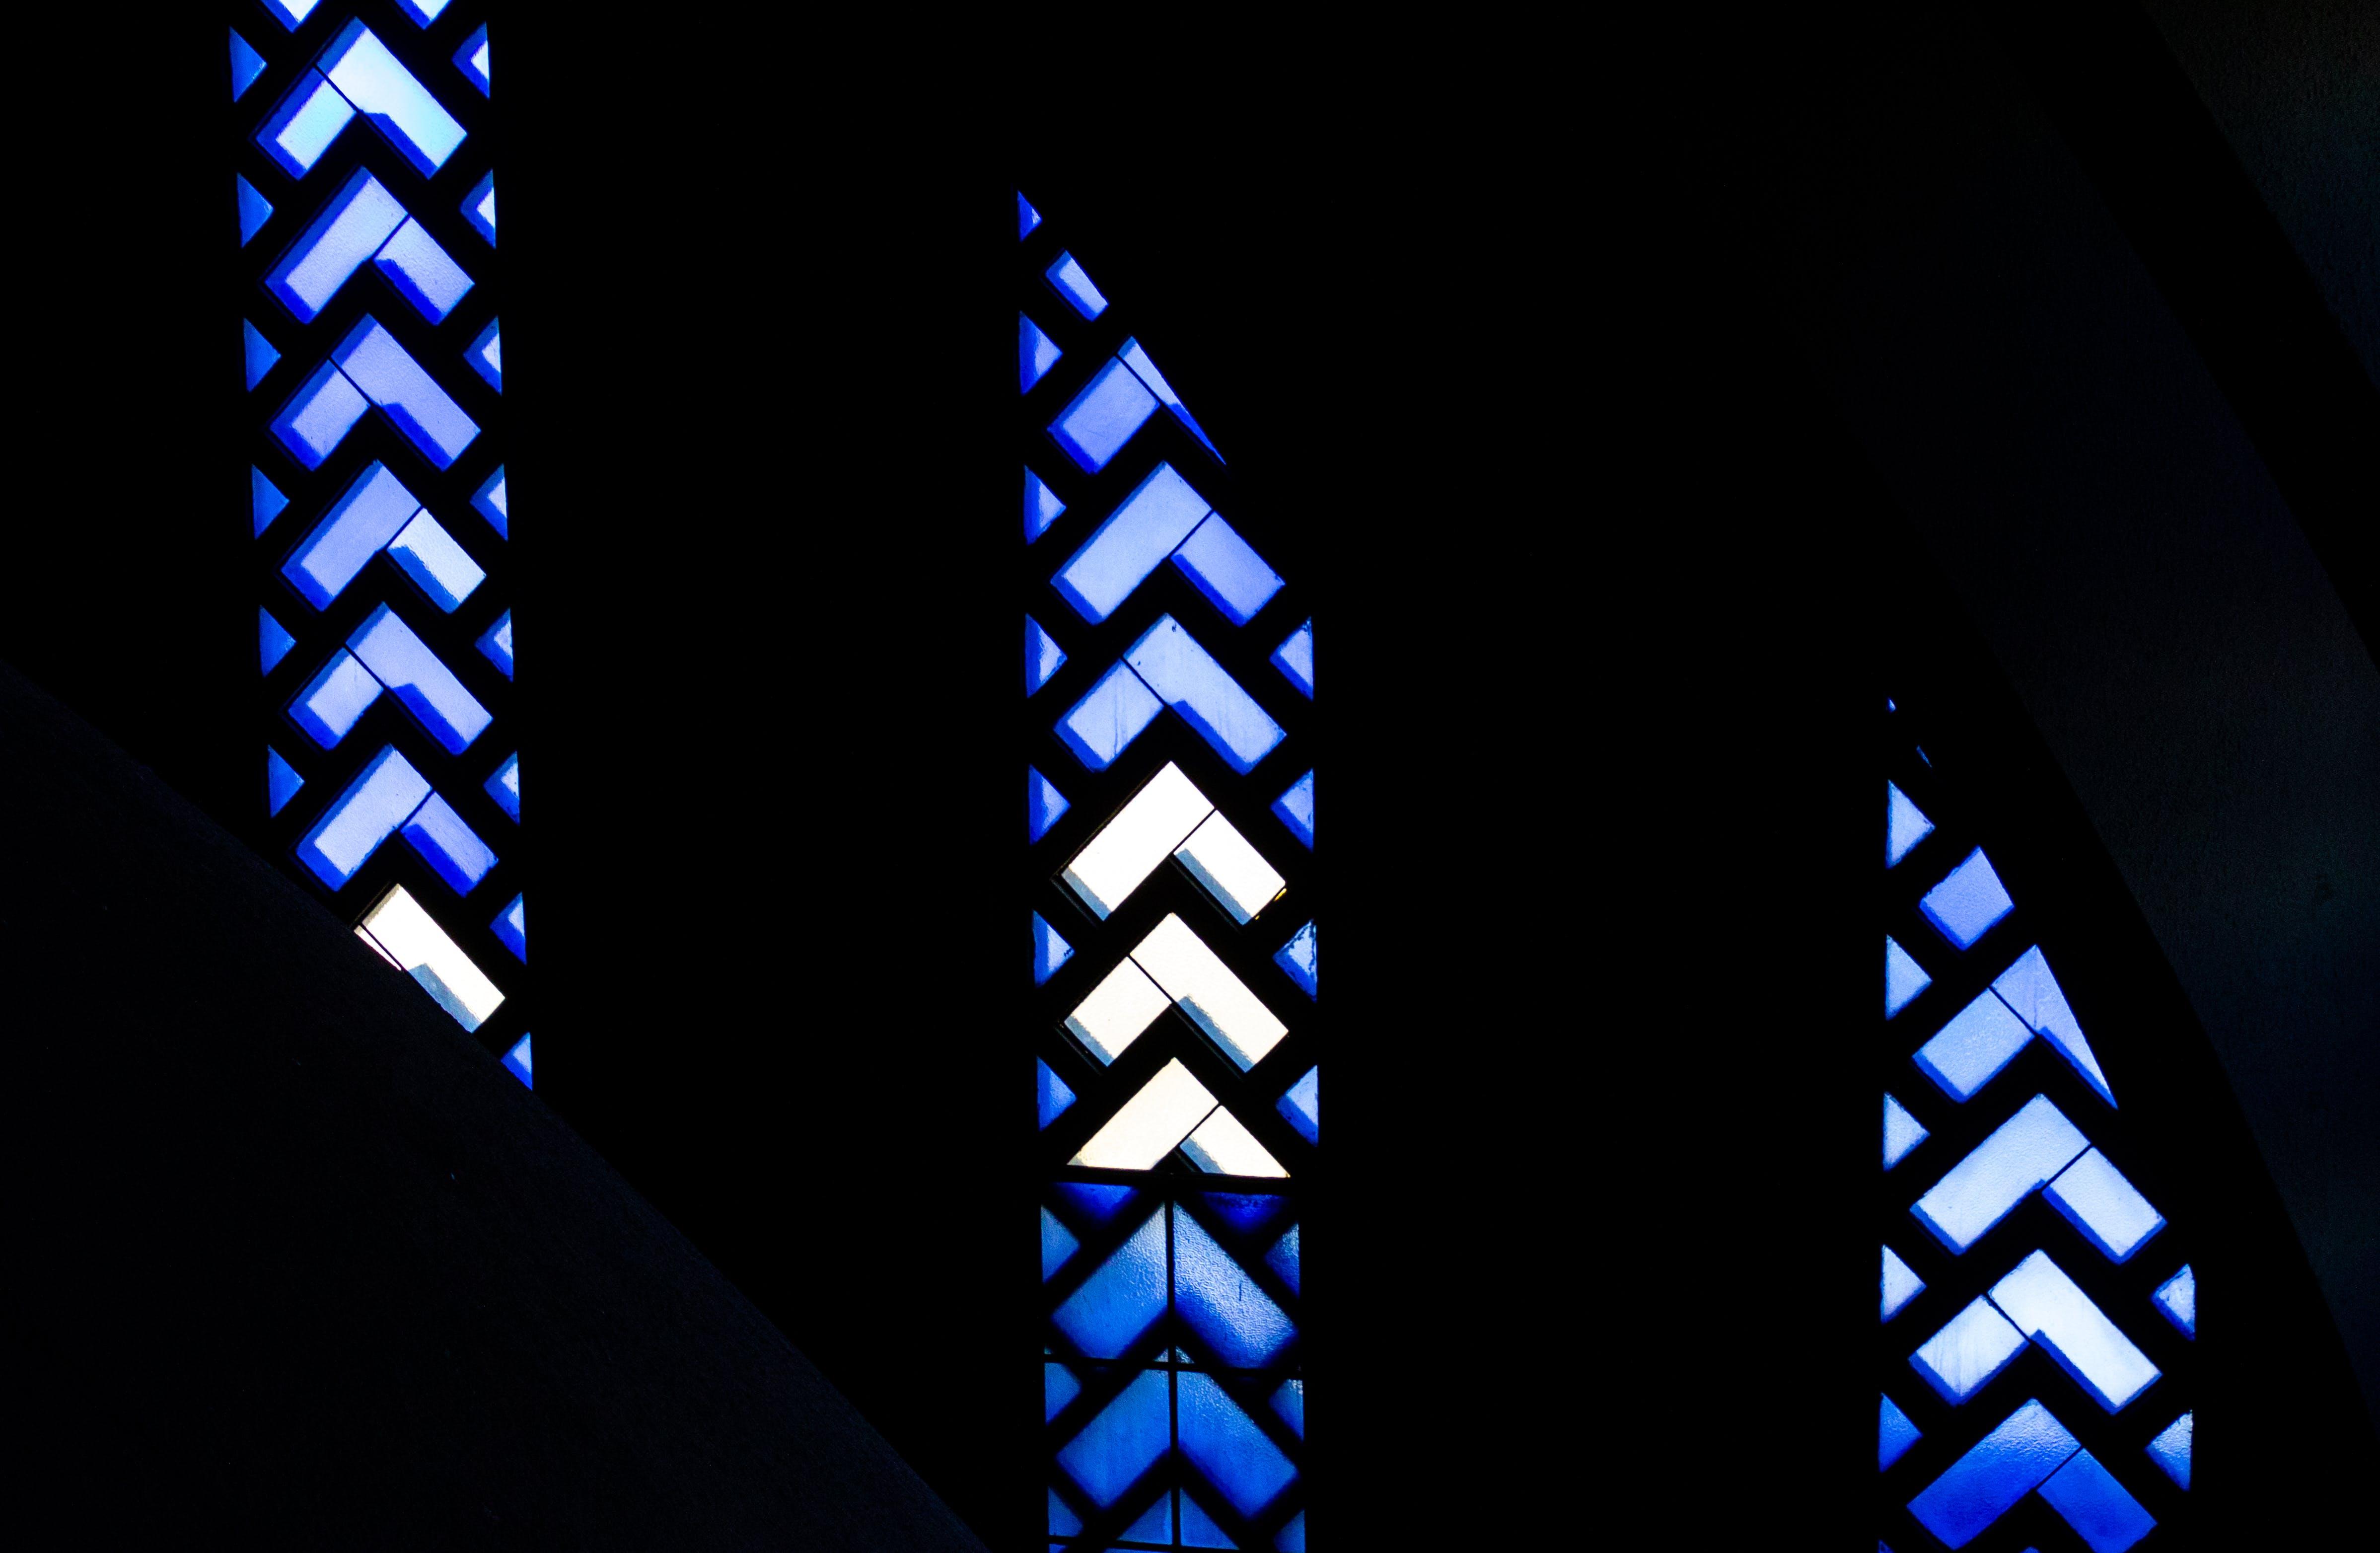 Silhouette Photo of Window